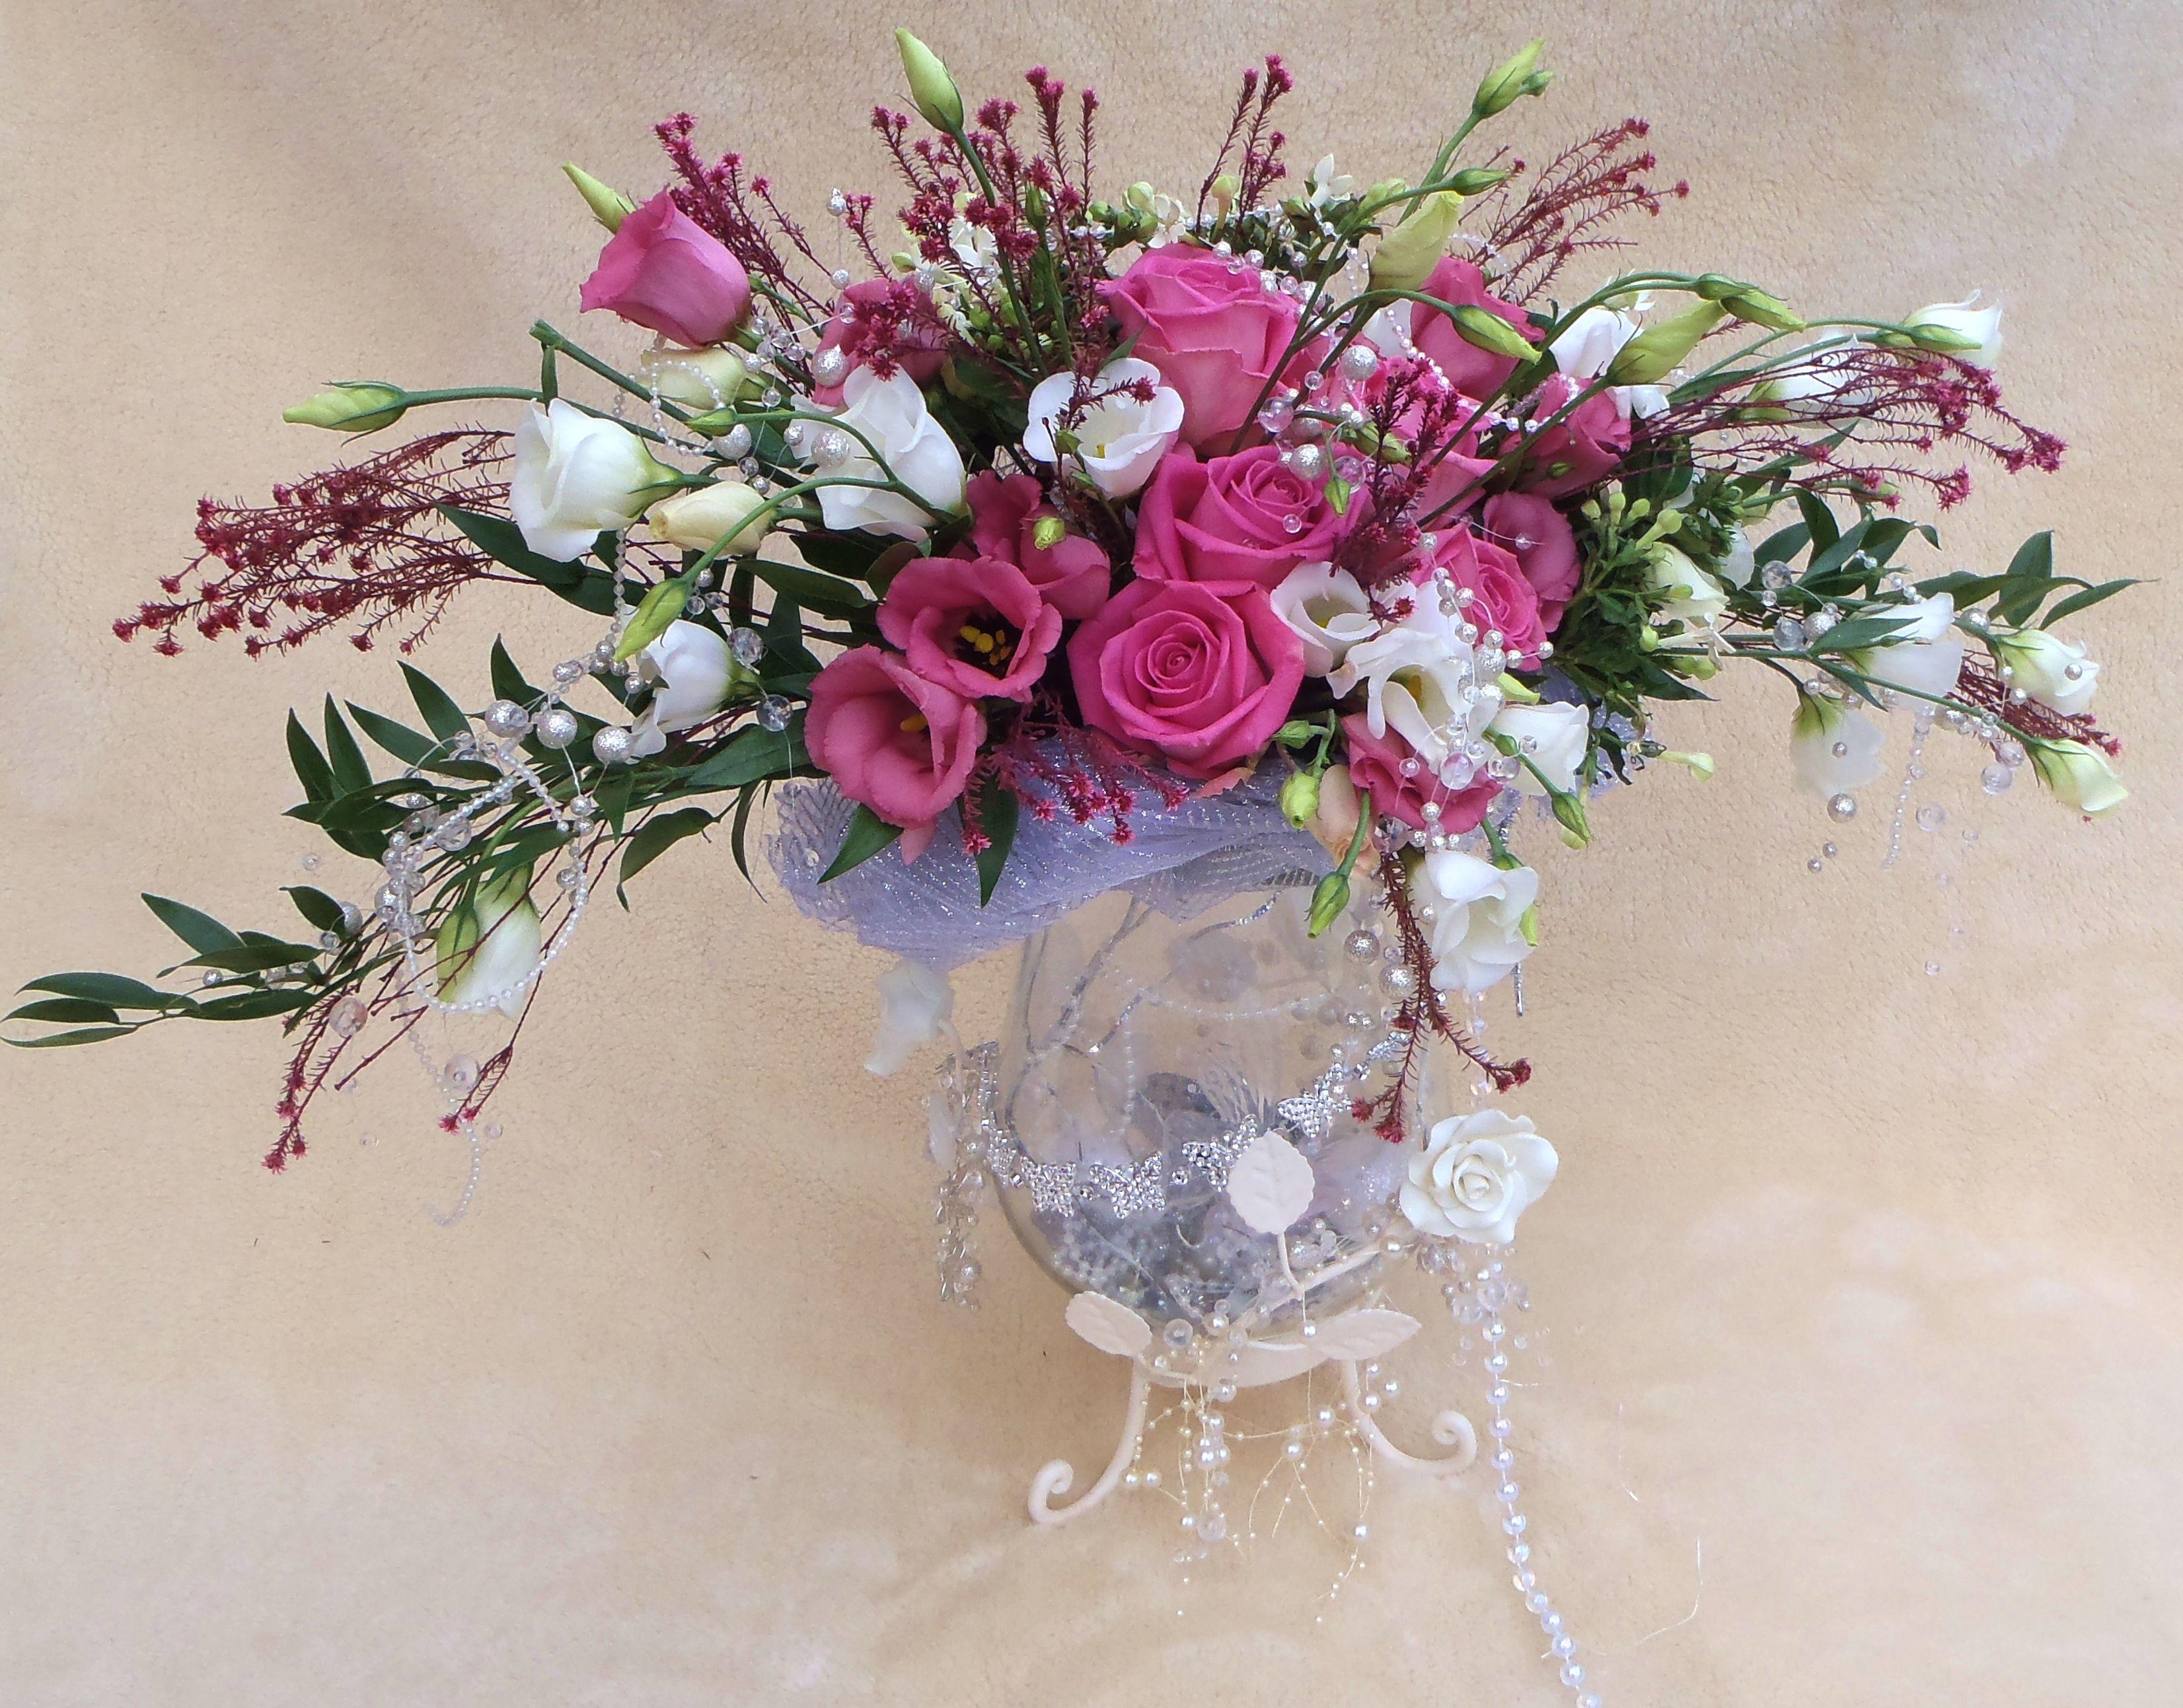 Vintage wedding table designbeautiful unusual flower designs vintage wedding table designbeautiful izmirmasajfo